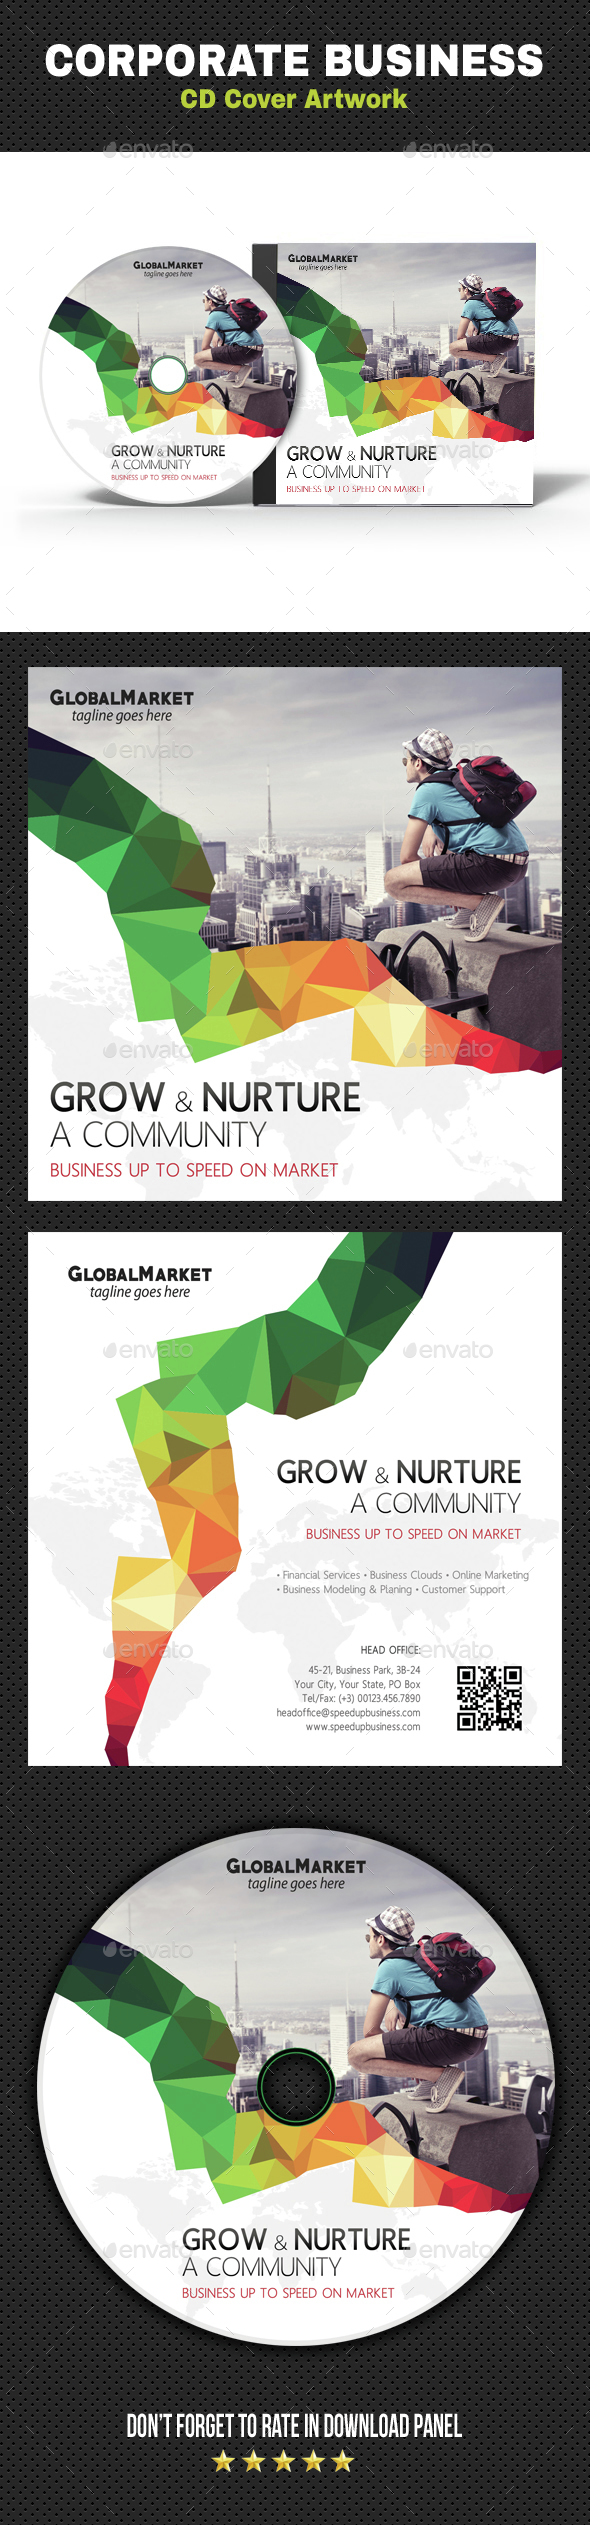 Corporate Business CD Cover Artwork V05 - CD & DVD Artwork Print Templates